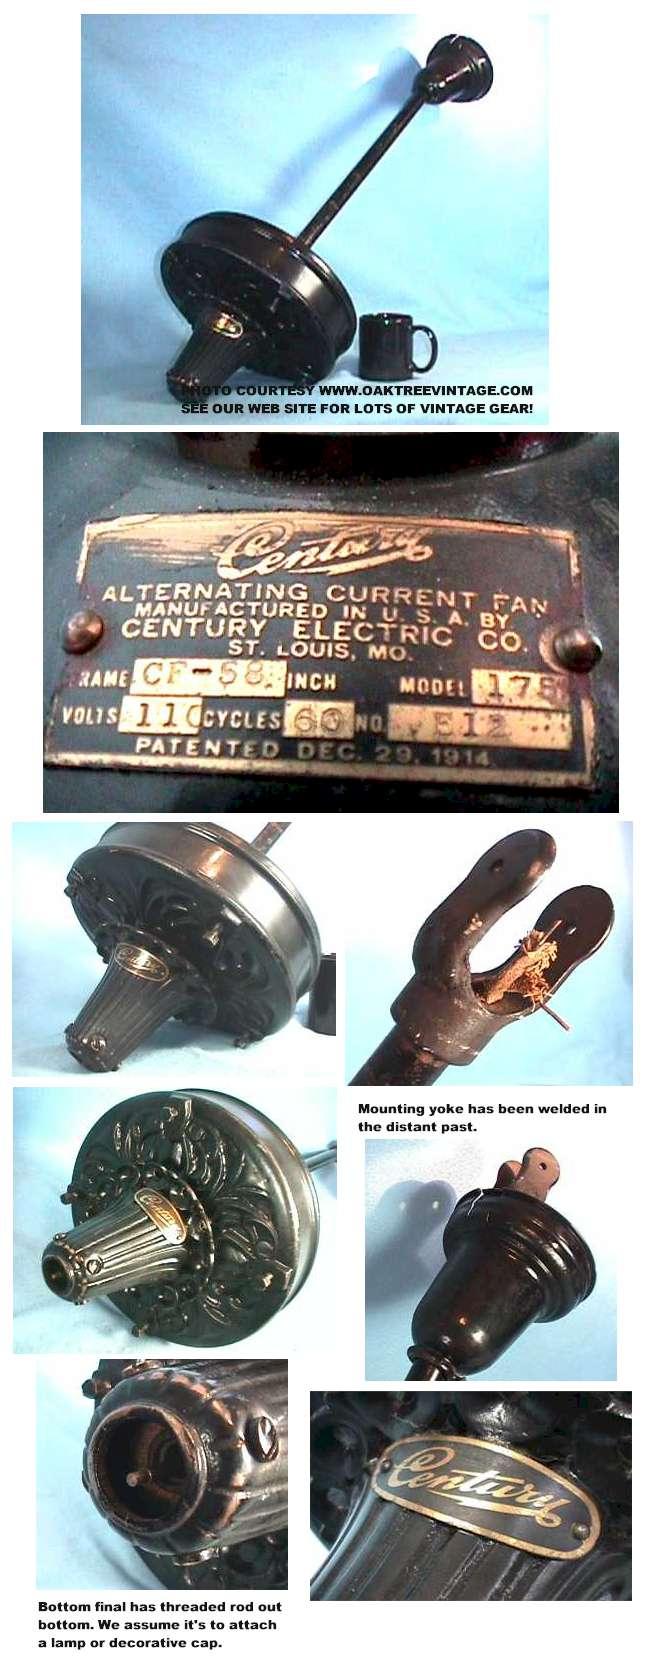 Antique Vintage Electric Fans Restored Refurbished And Reproduction Fans Vintage Deco Fans By